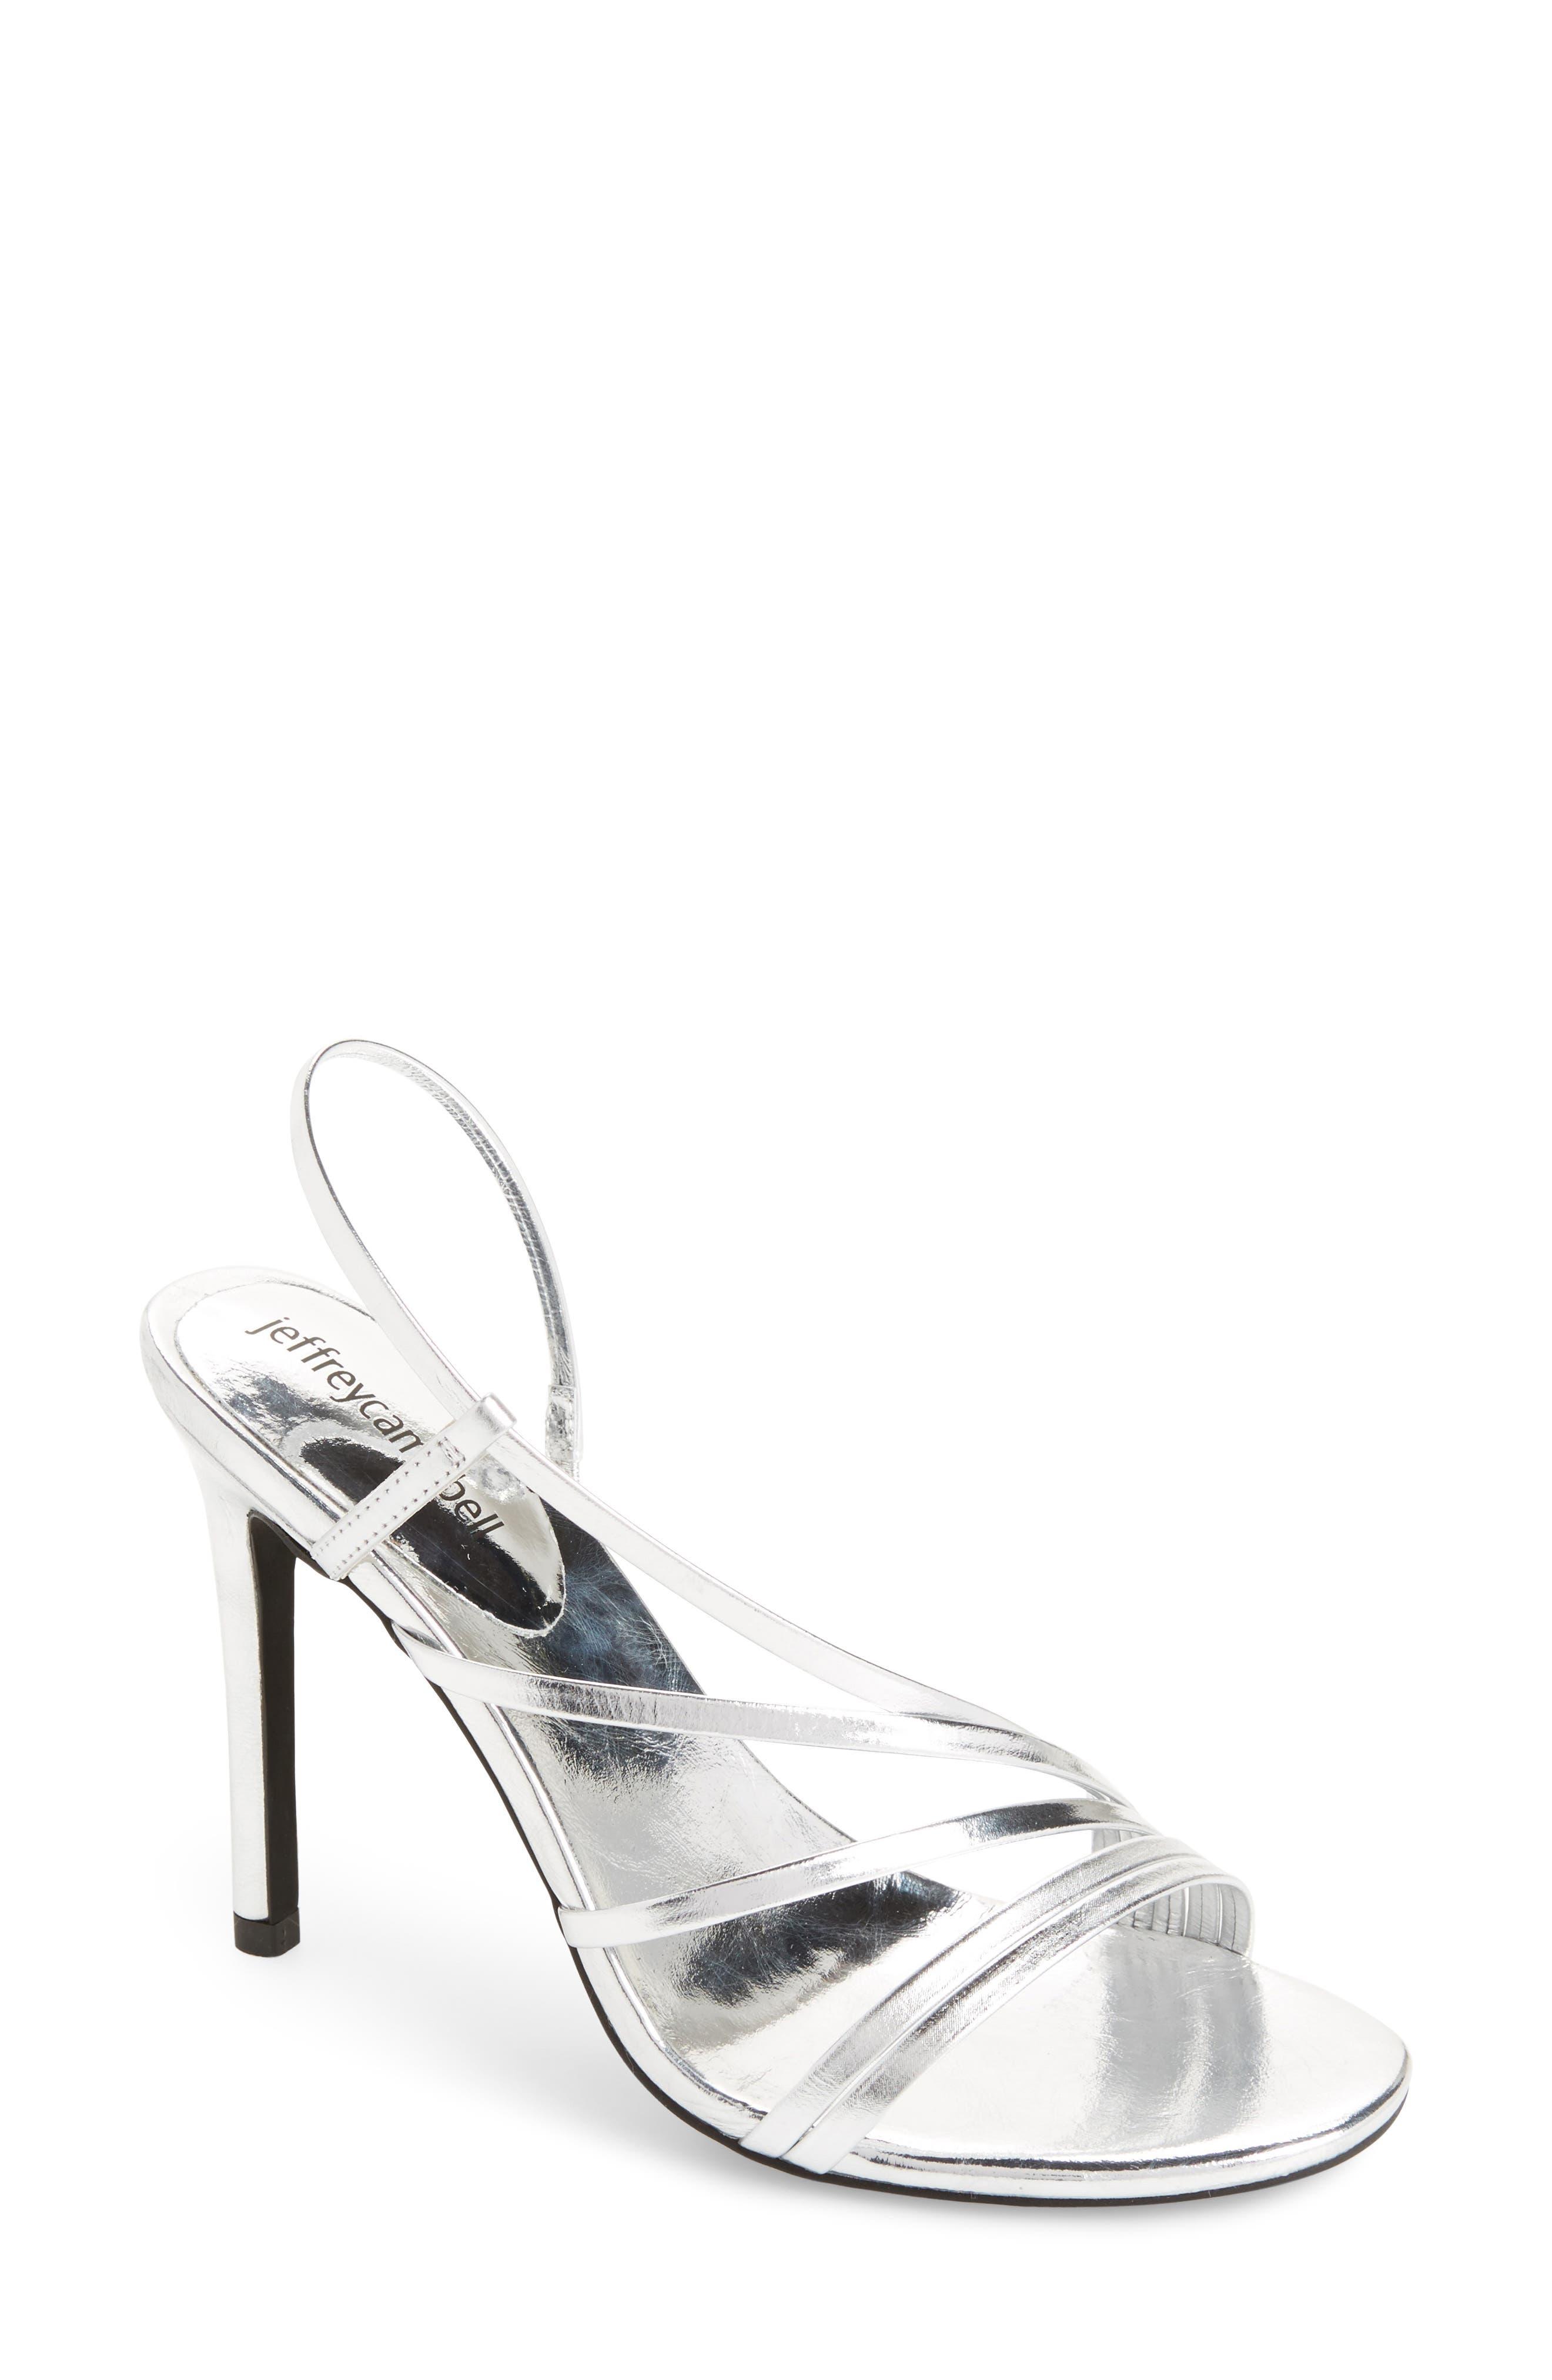 Lilian Asymmetrical Strappy Sandal,                         Main,                         color, Silver Leather